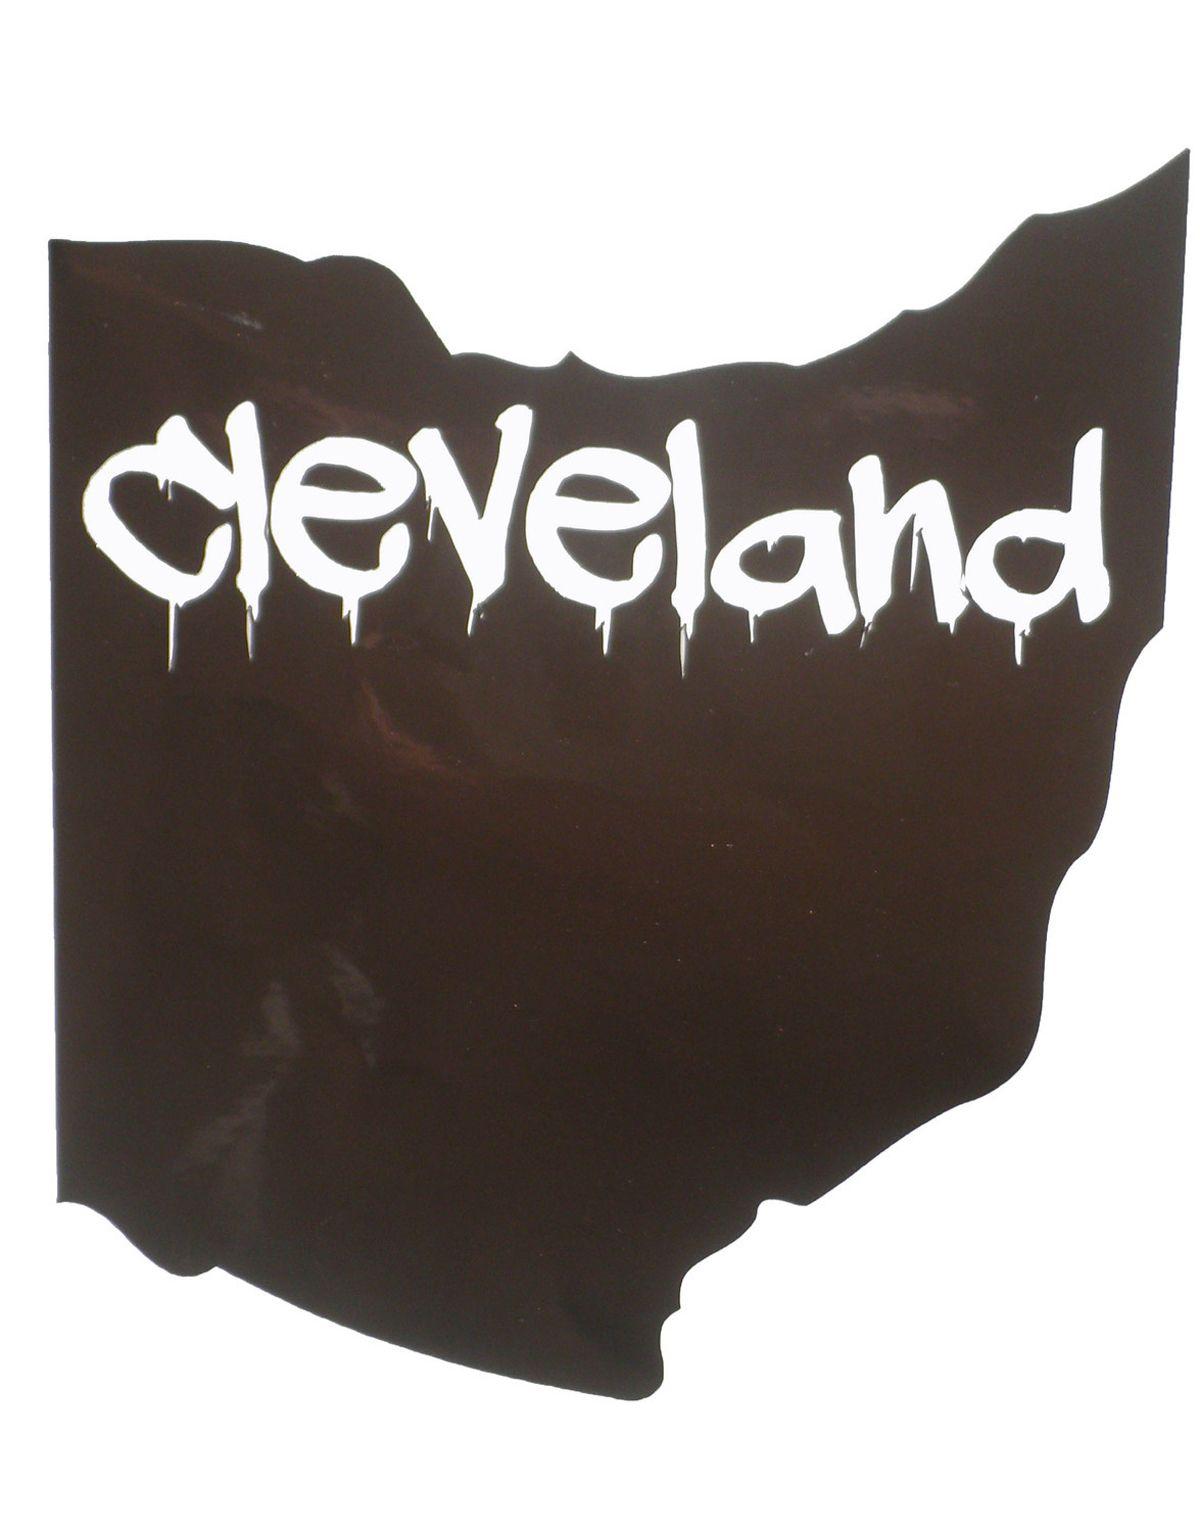 Get This Cool Cleveland Ohio Sticker Online At US Custom - Custom vinyl decals cleveland ohio